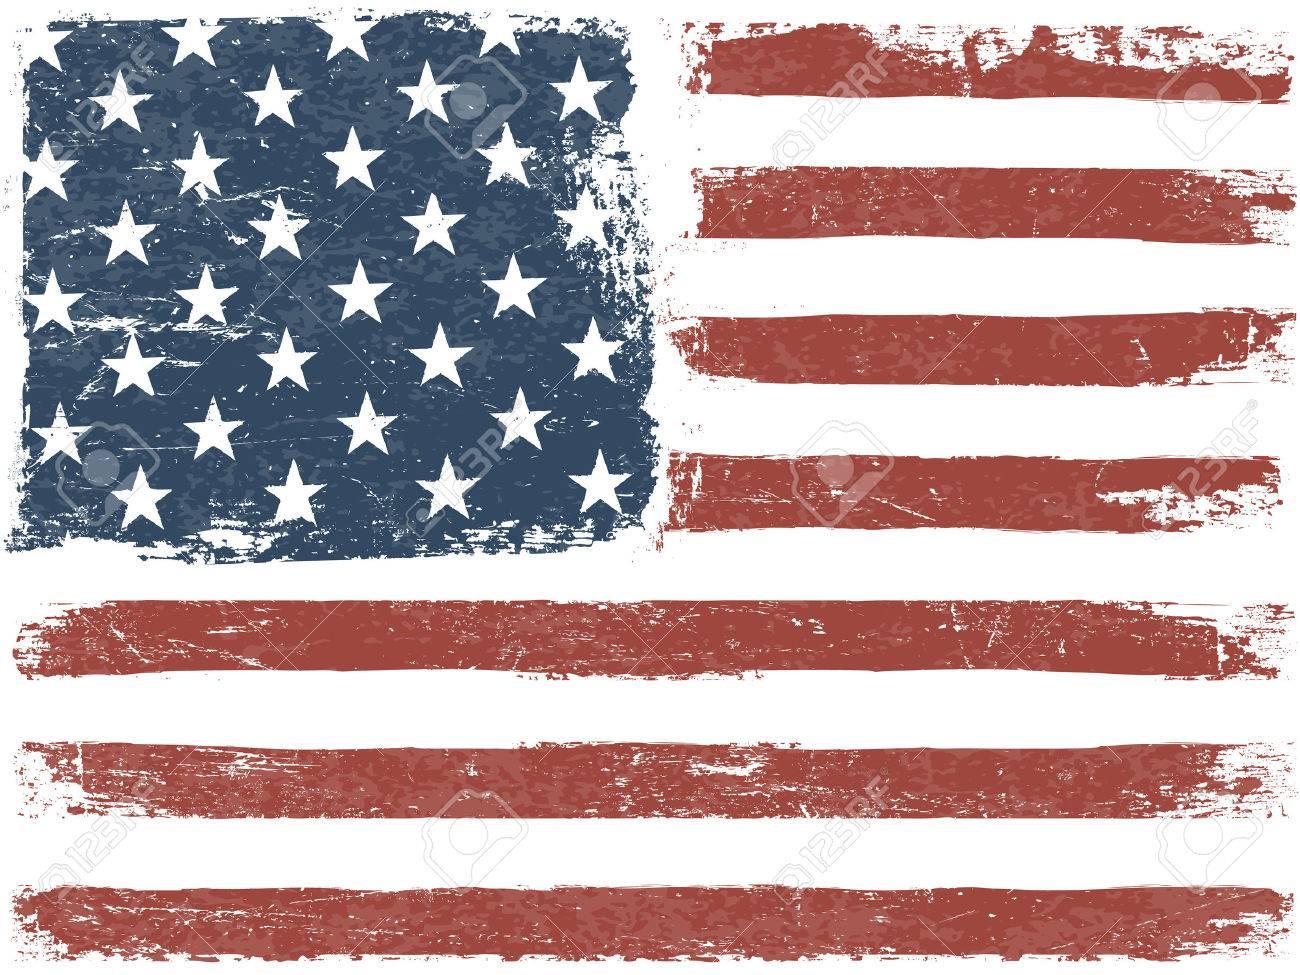 American Flag Grunge Background. Vector Template. Horizontal orientation. - 53602695